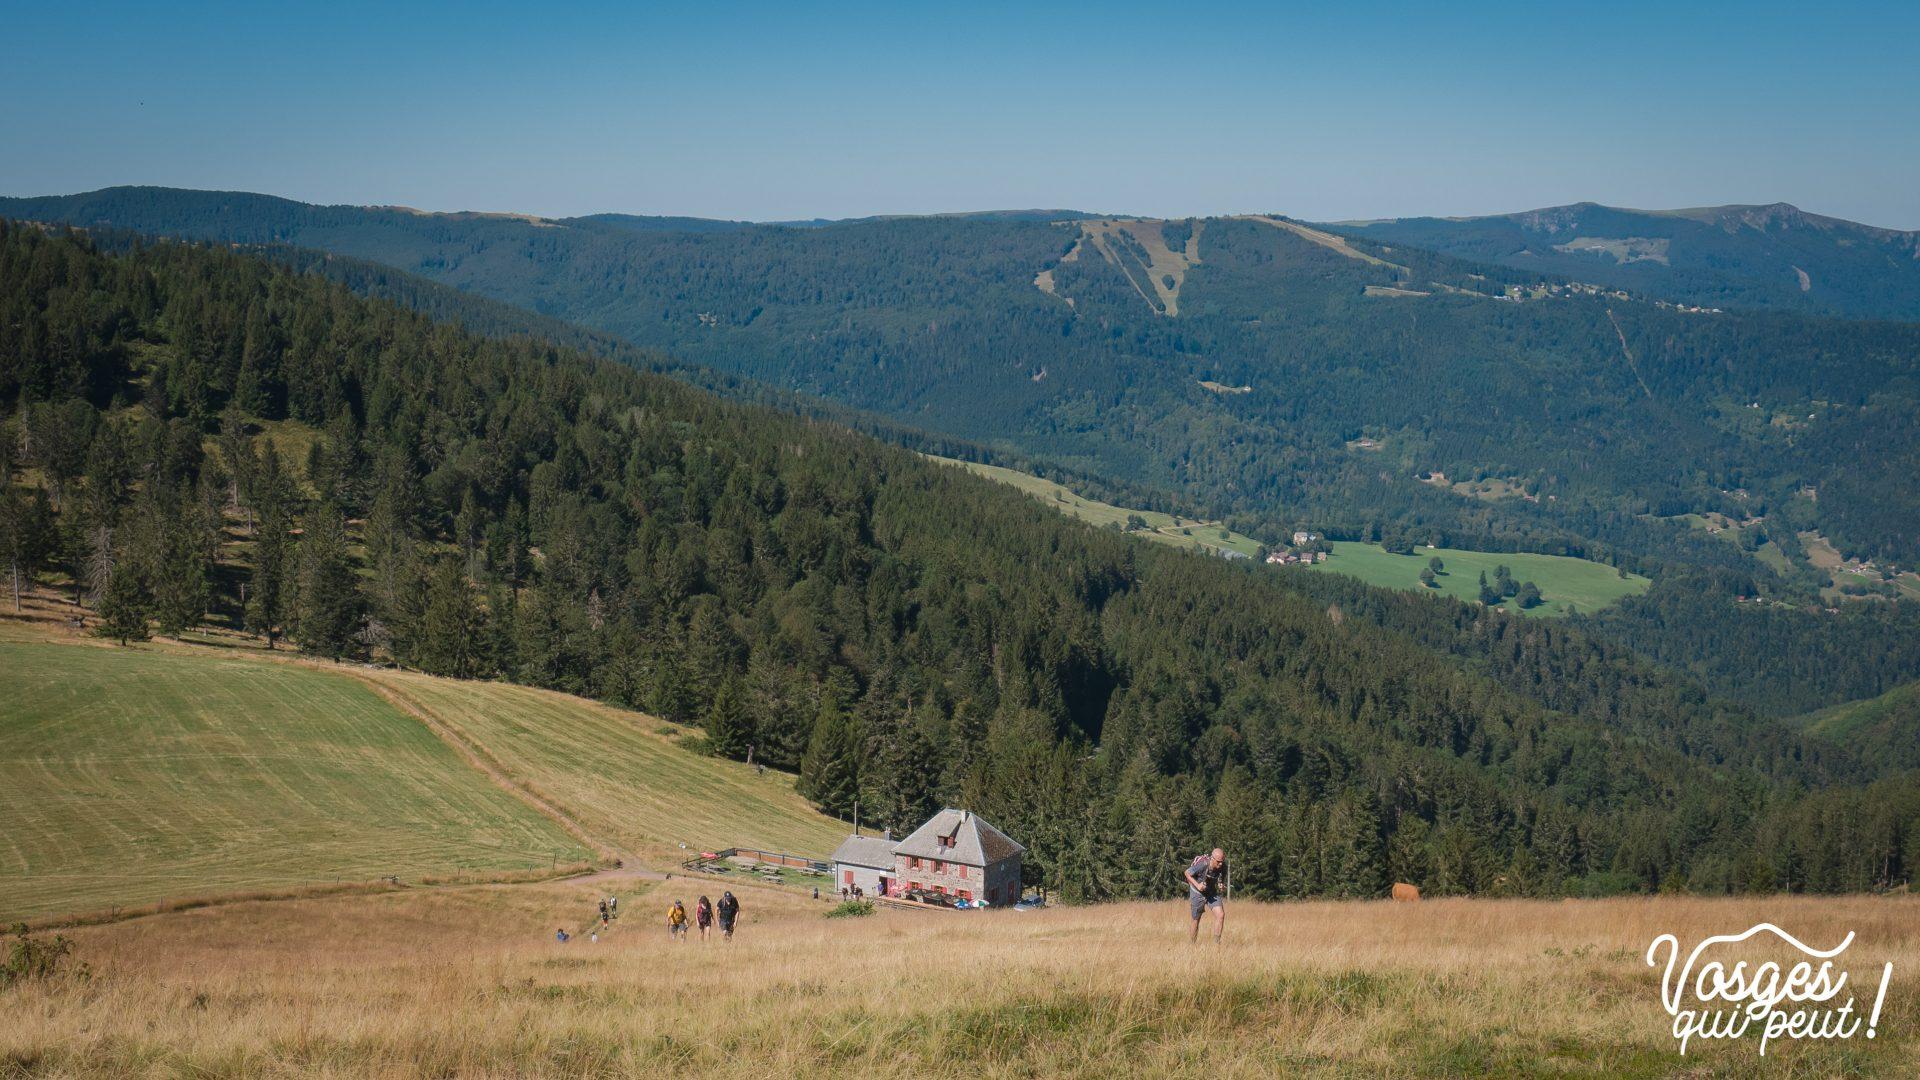 Vue sur refuge du Rothenbruenn dans le Massif des Vosges